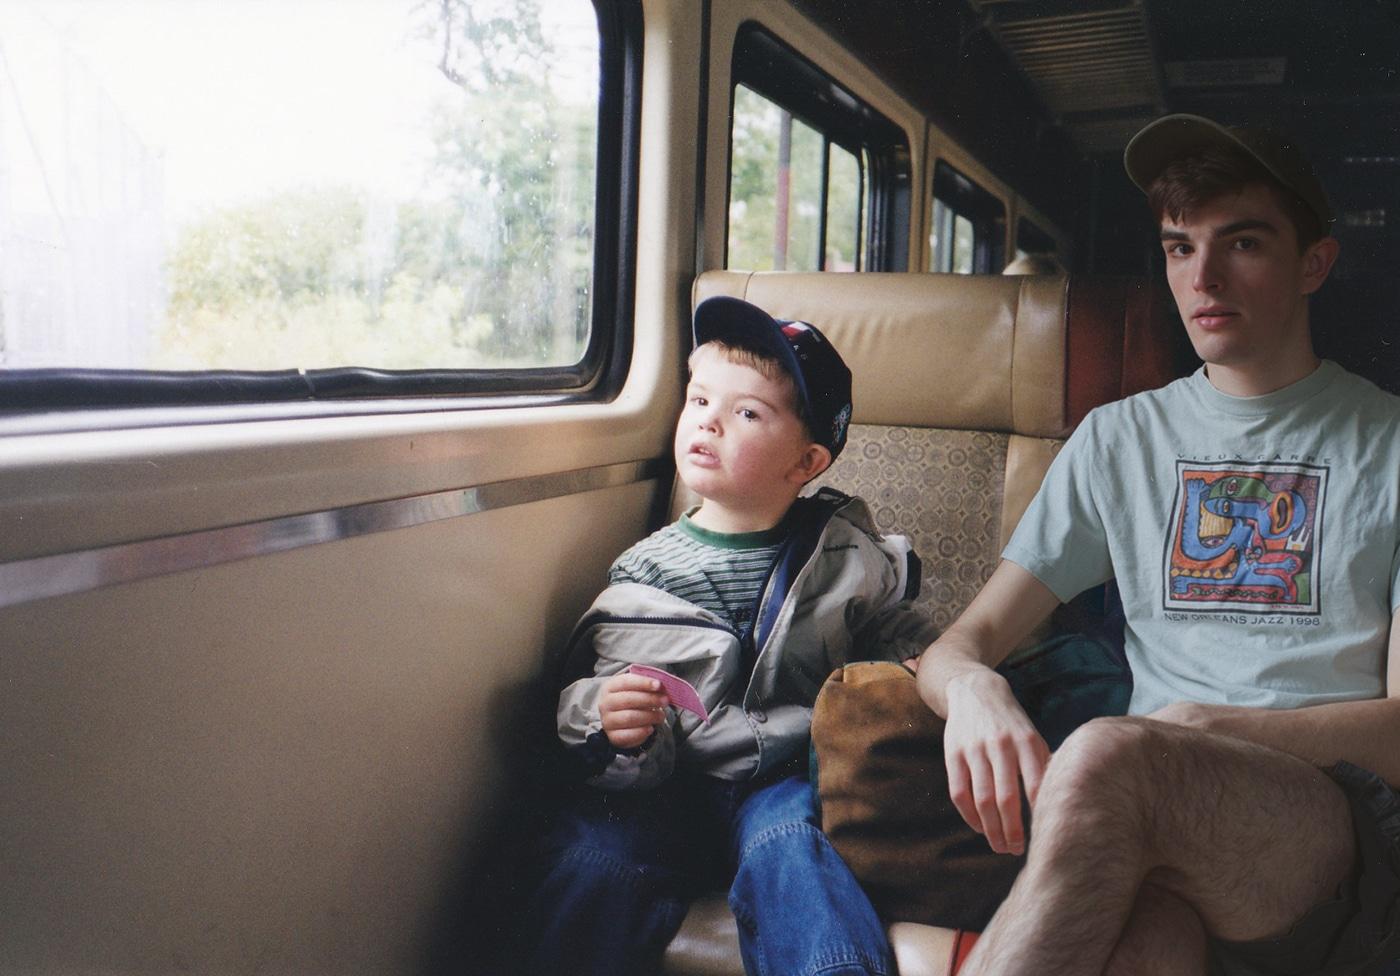 Childhood Photoshop Family Photos